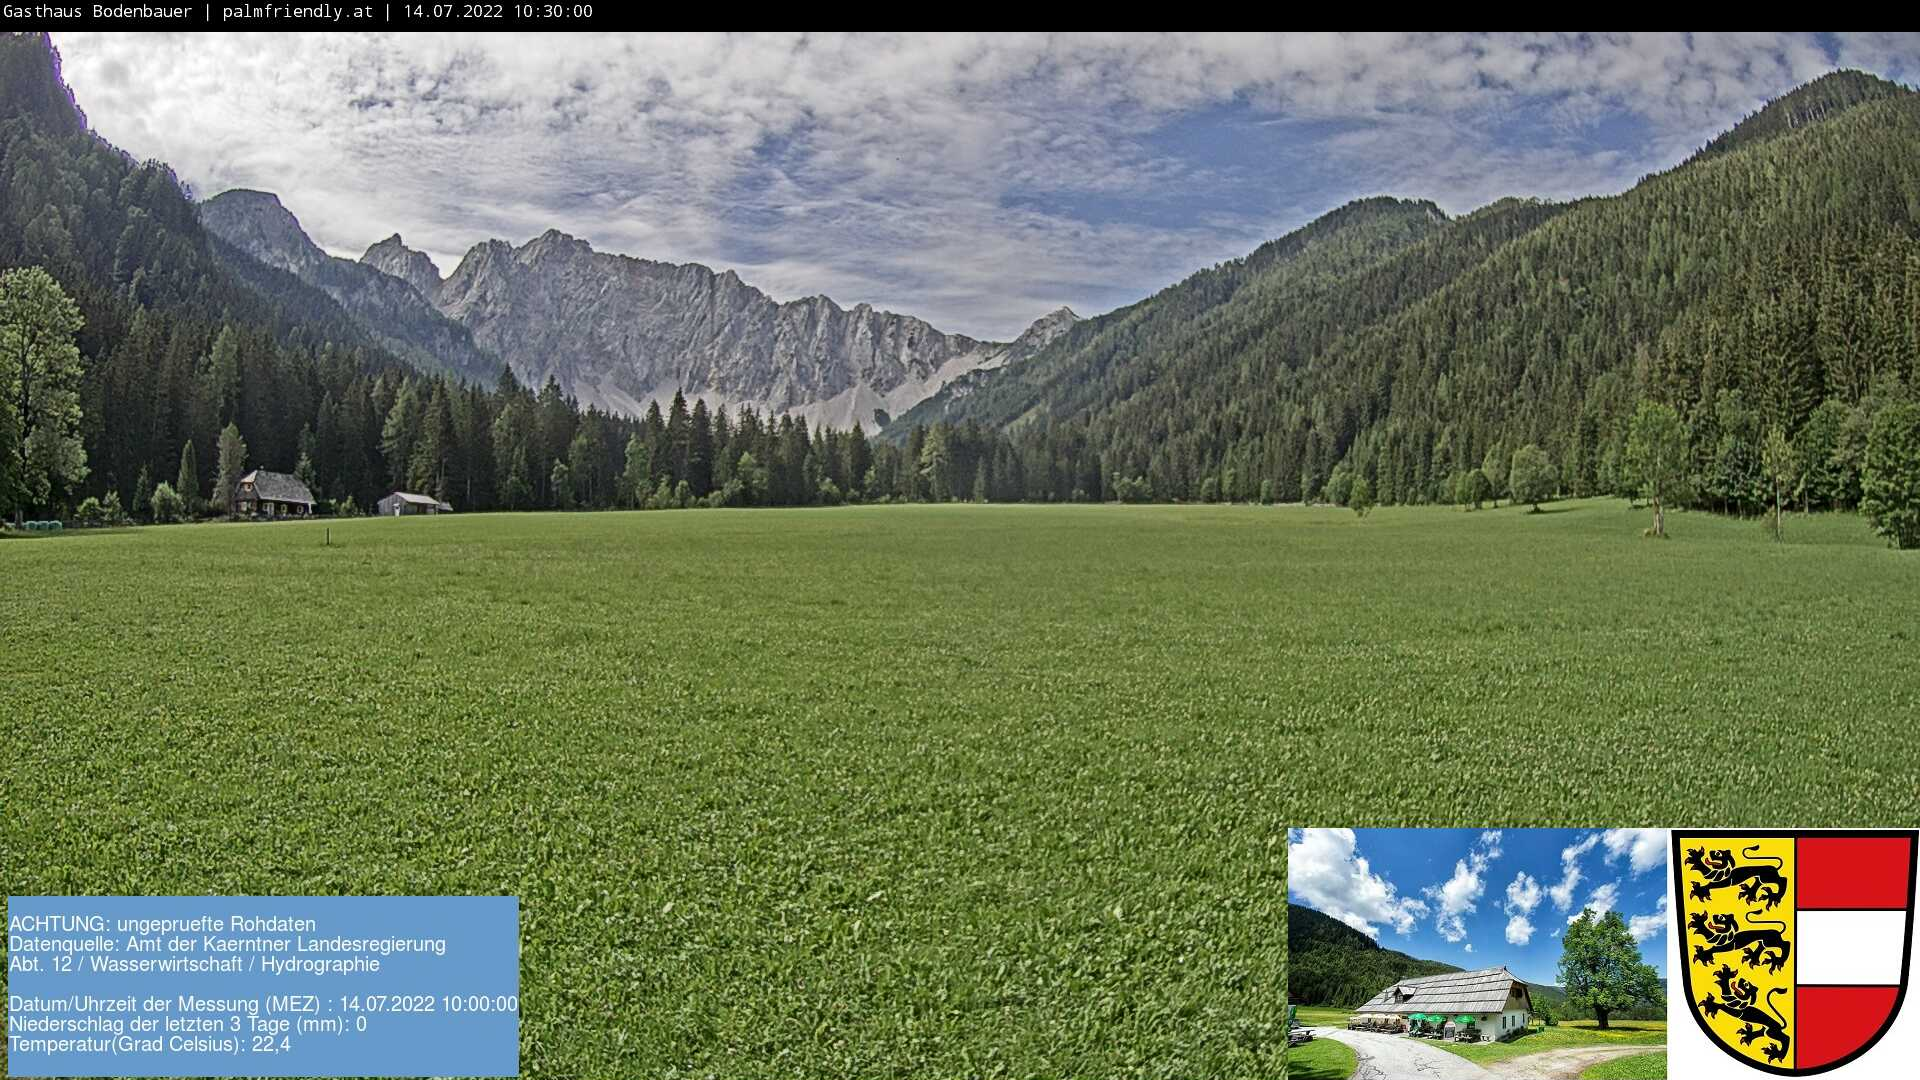 webcam - Bodenbauer